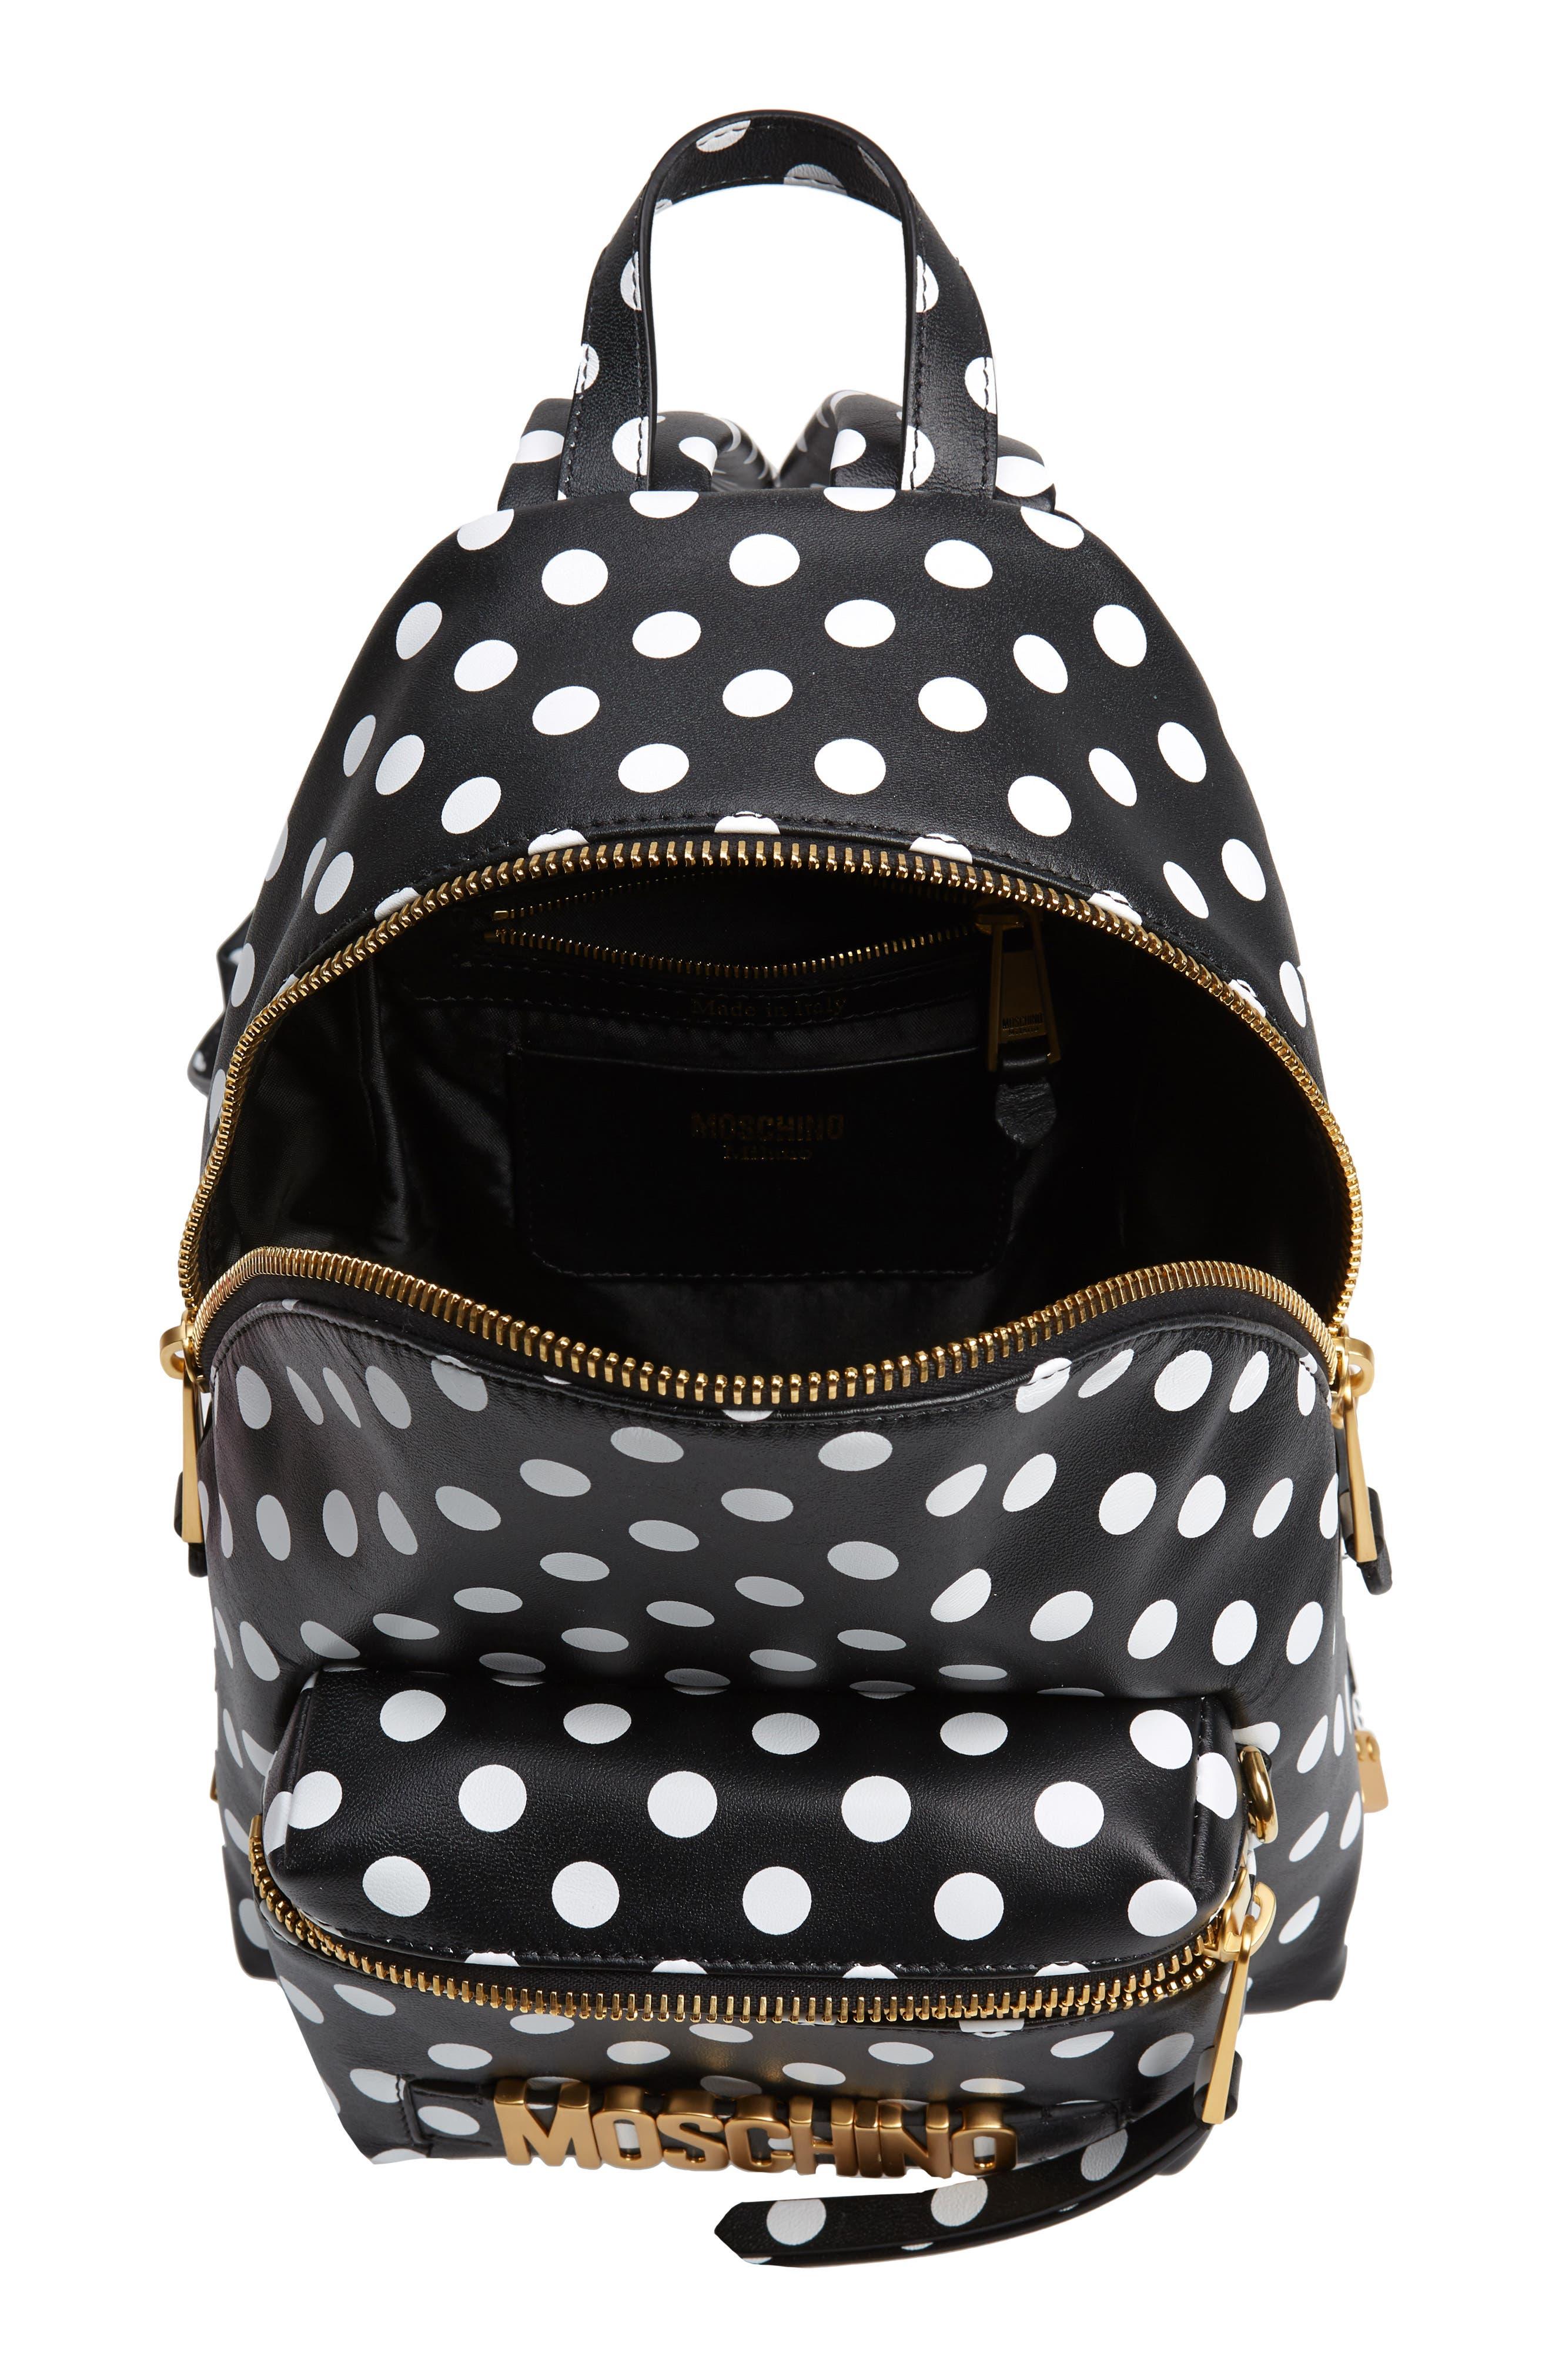 MOSCHINO, Logo Polka Dot Backpack, Alternate thumbnail 4, color, BLACK/ WHITE